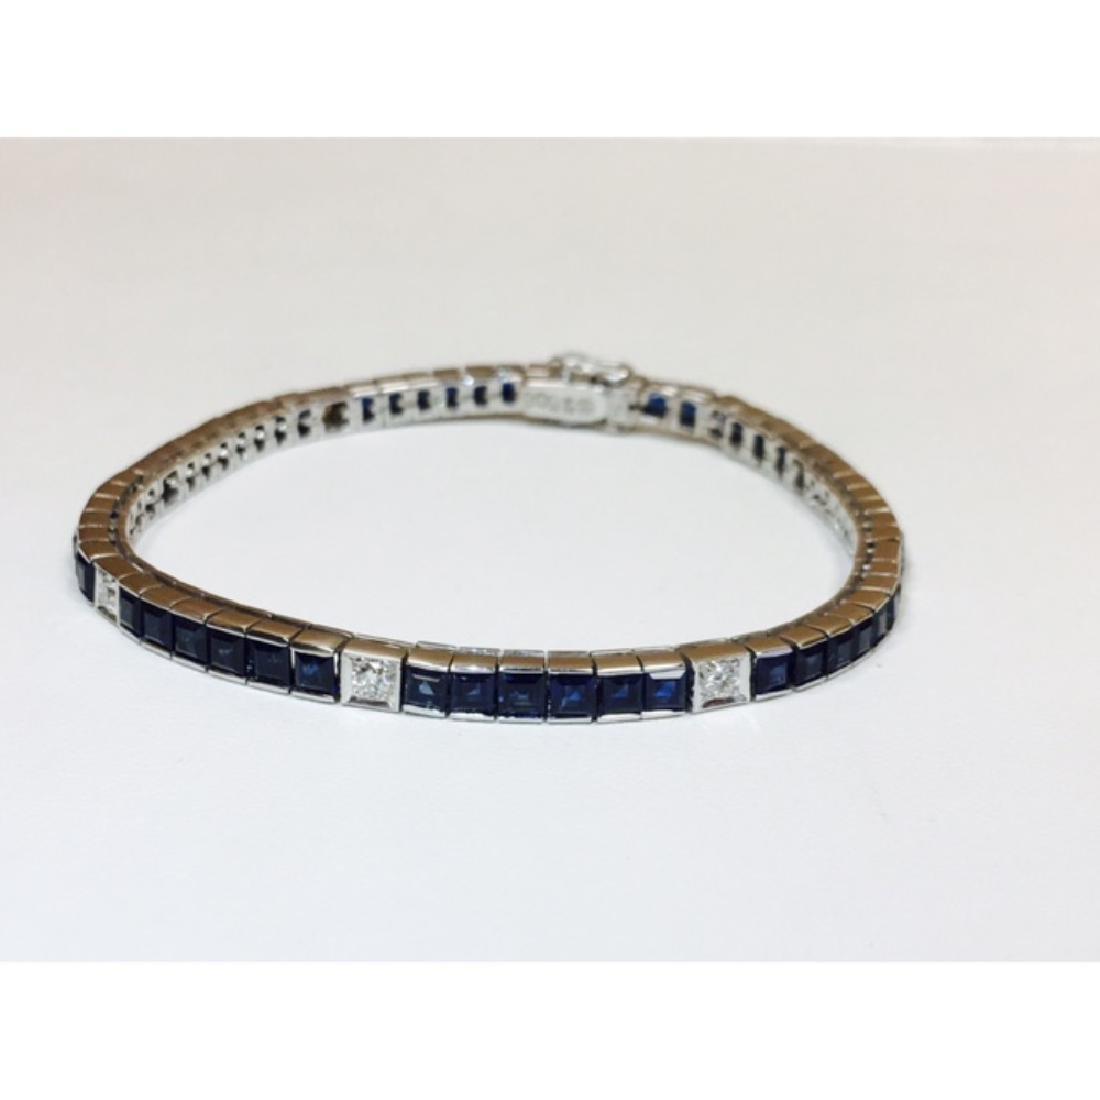 18K, 4.00 Carat Blue Sapphire and Diamond Bracelet - 2